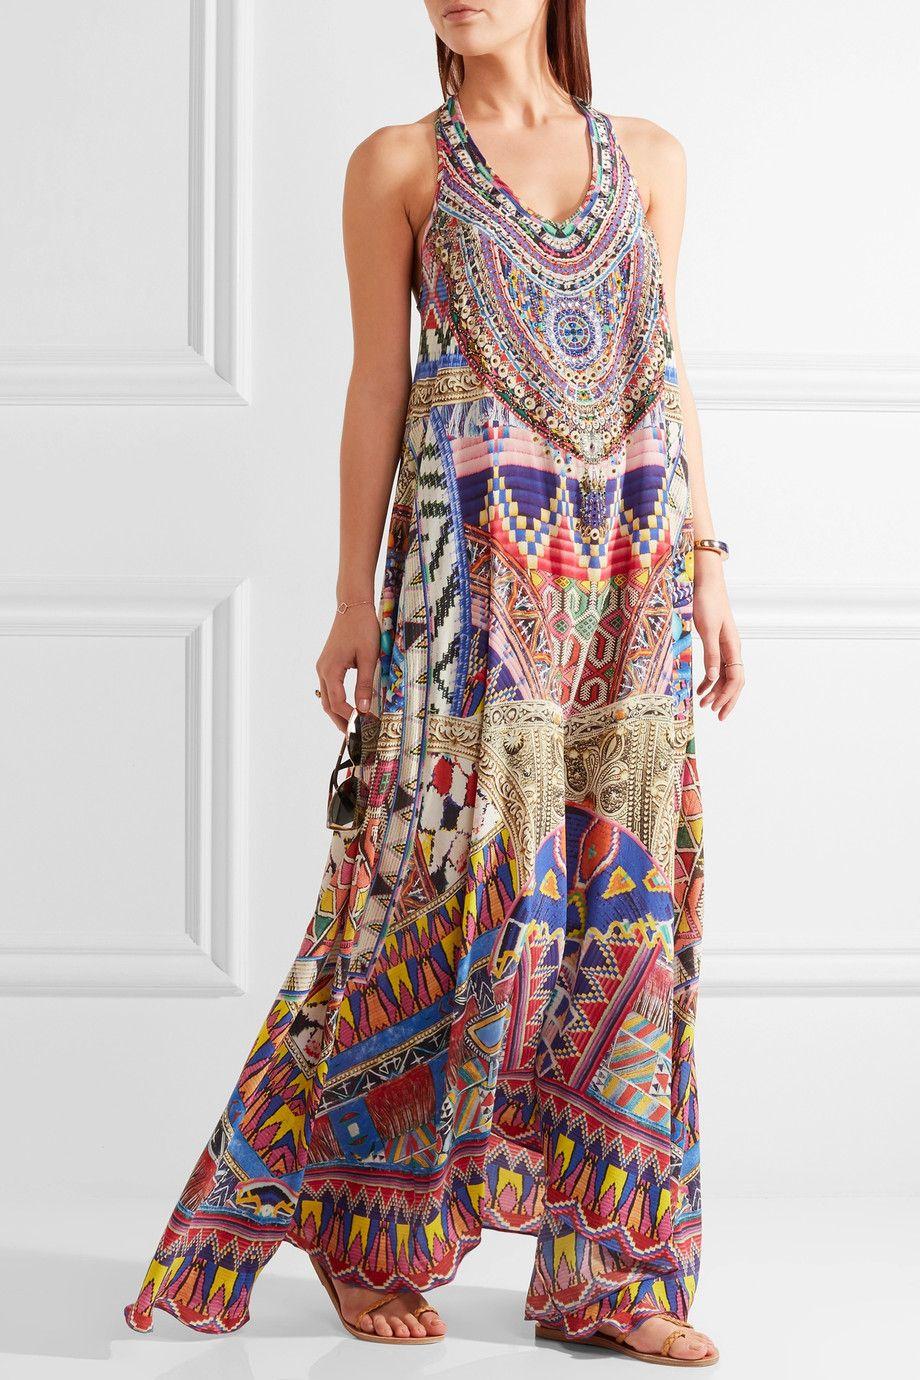 581de623d161 Camilla | Embellished printed silk crepe de chine maxi dress |  NET-A-PORTER.COM